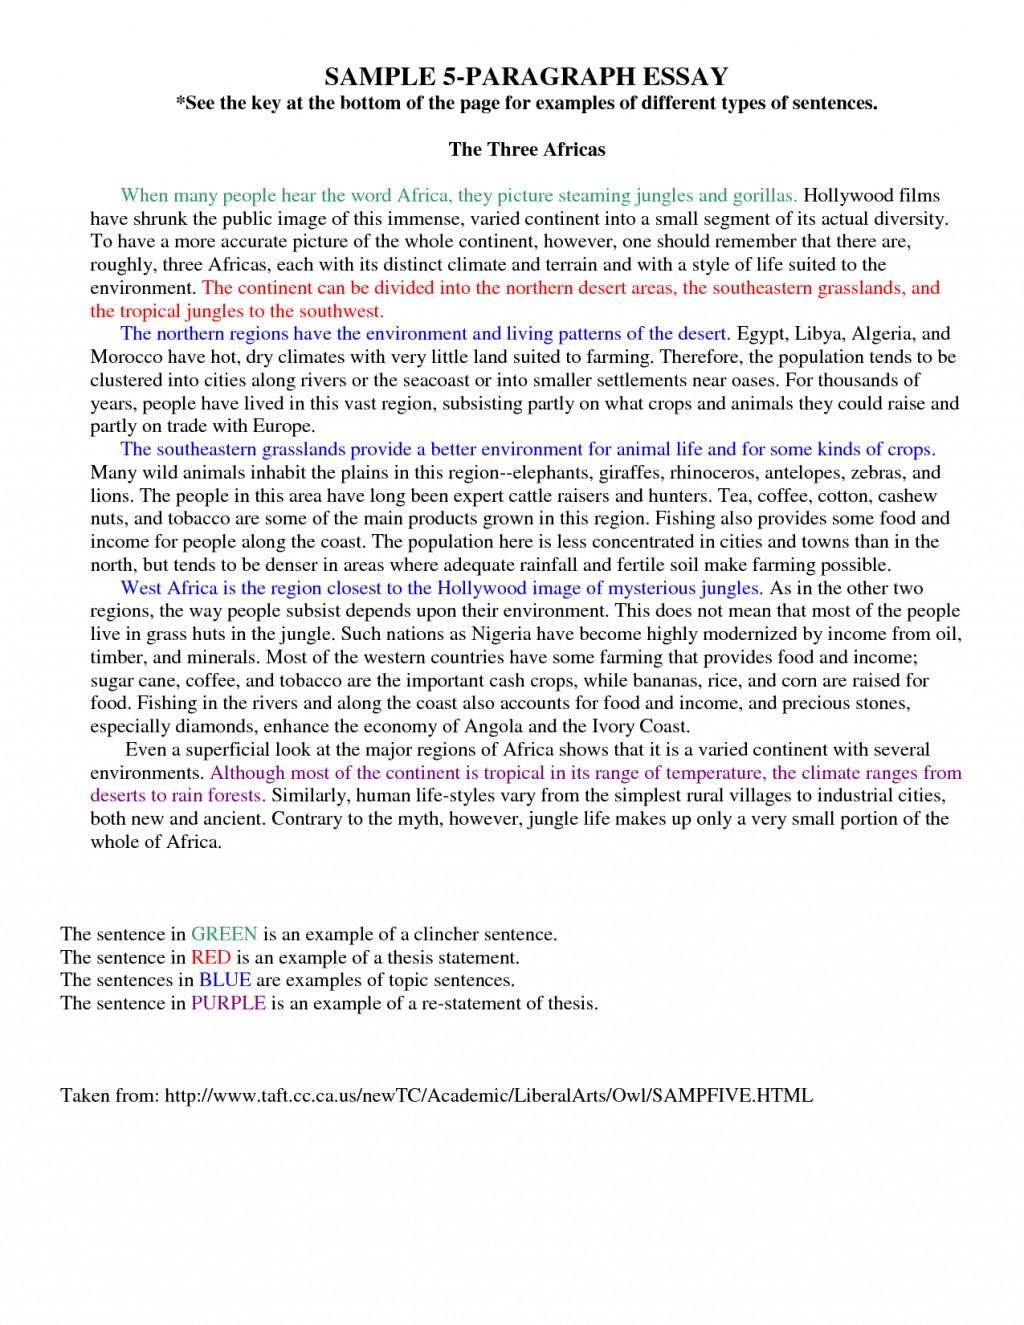 011 Essay Example Format Of Paragraph Sample Dicom Tester Cover Letter Stirring 5 High School Pdf Argumentative Outline Template Five Large